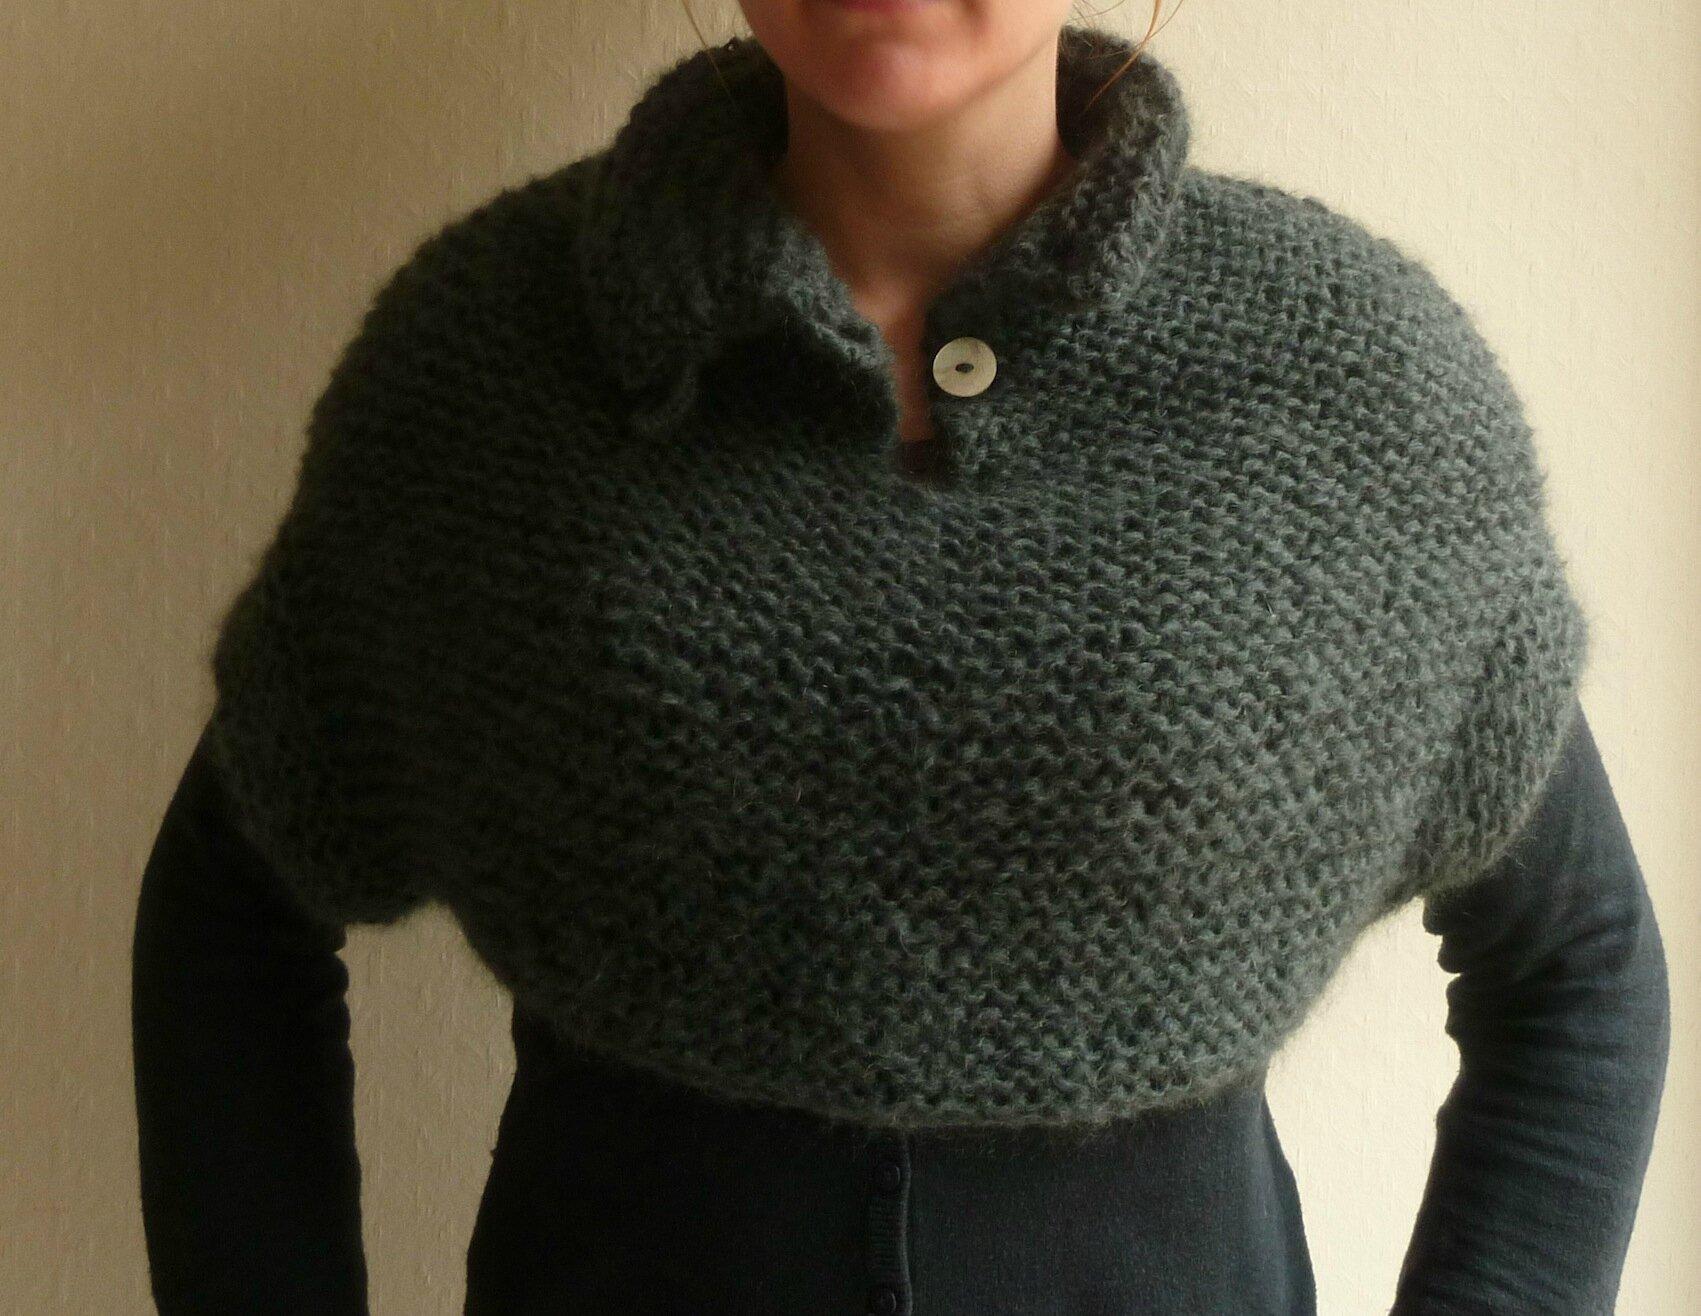 tricoter un chauffe epaule facile